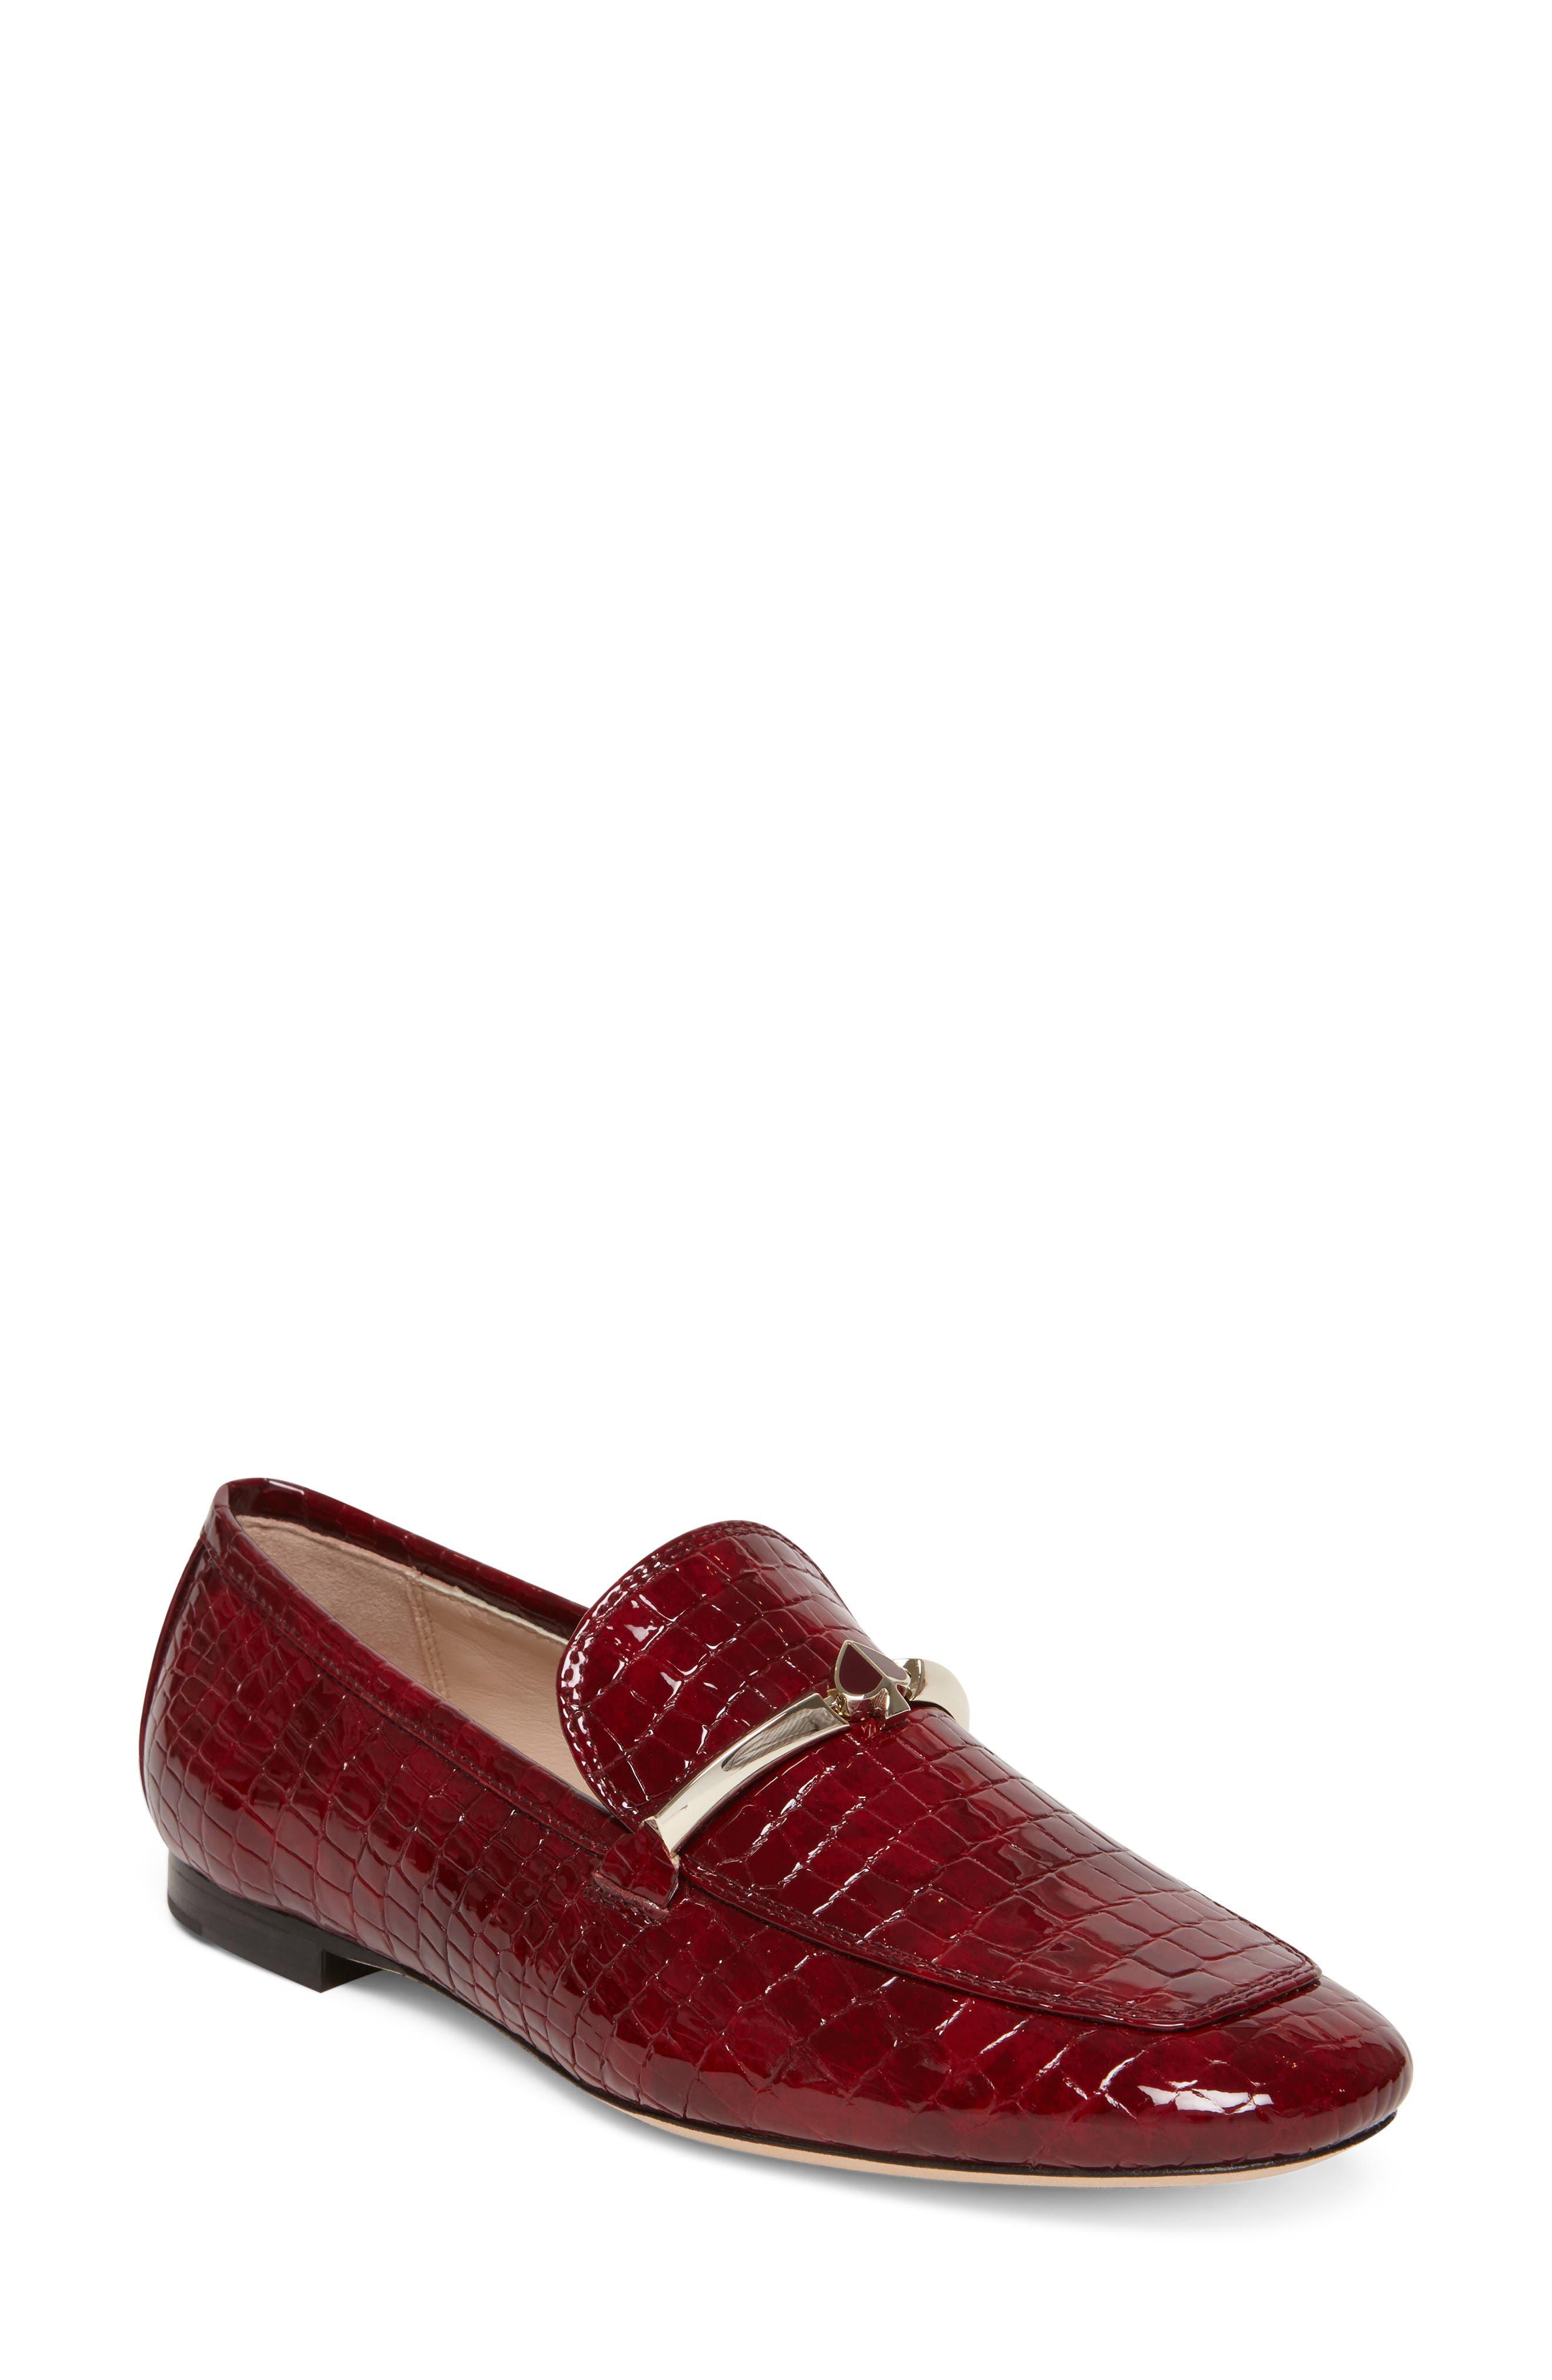 kate spade new york | lana loafer